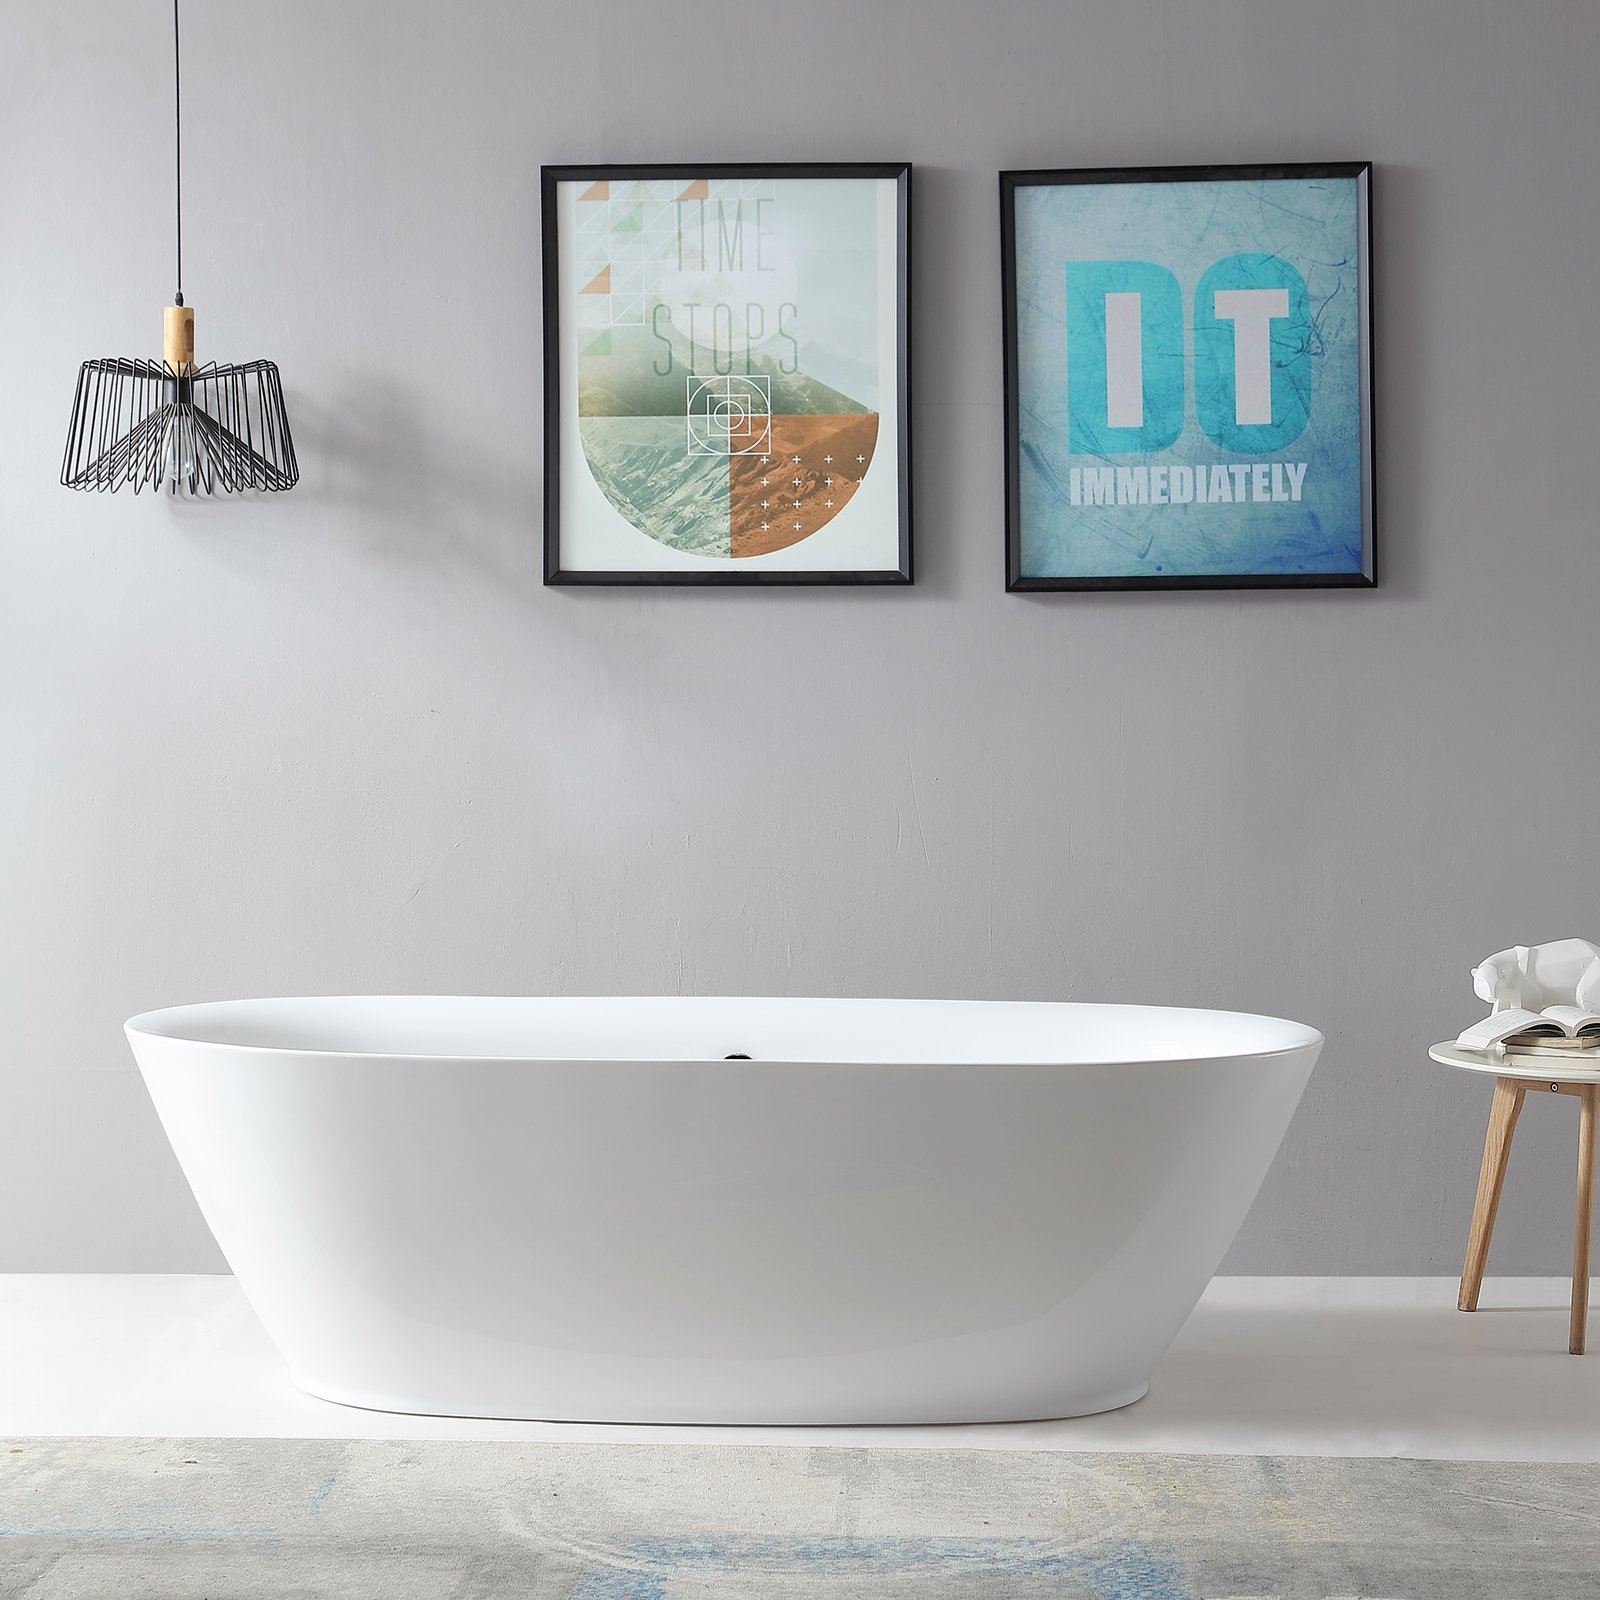 Freistehende Badewanne ROMA ACRYL weiß BS-916 180x84 inkl. Armatur 8028 zoom thumbnail 3